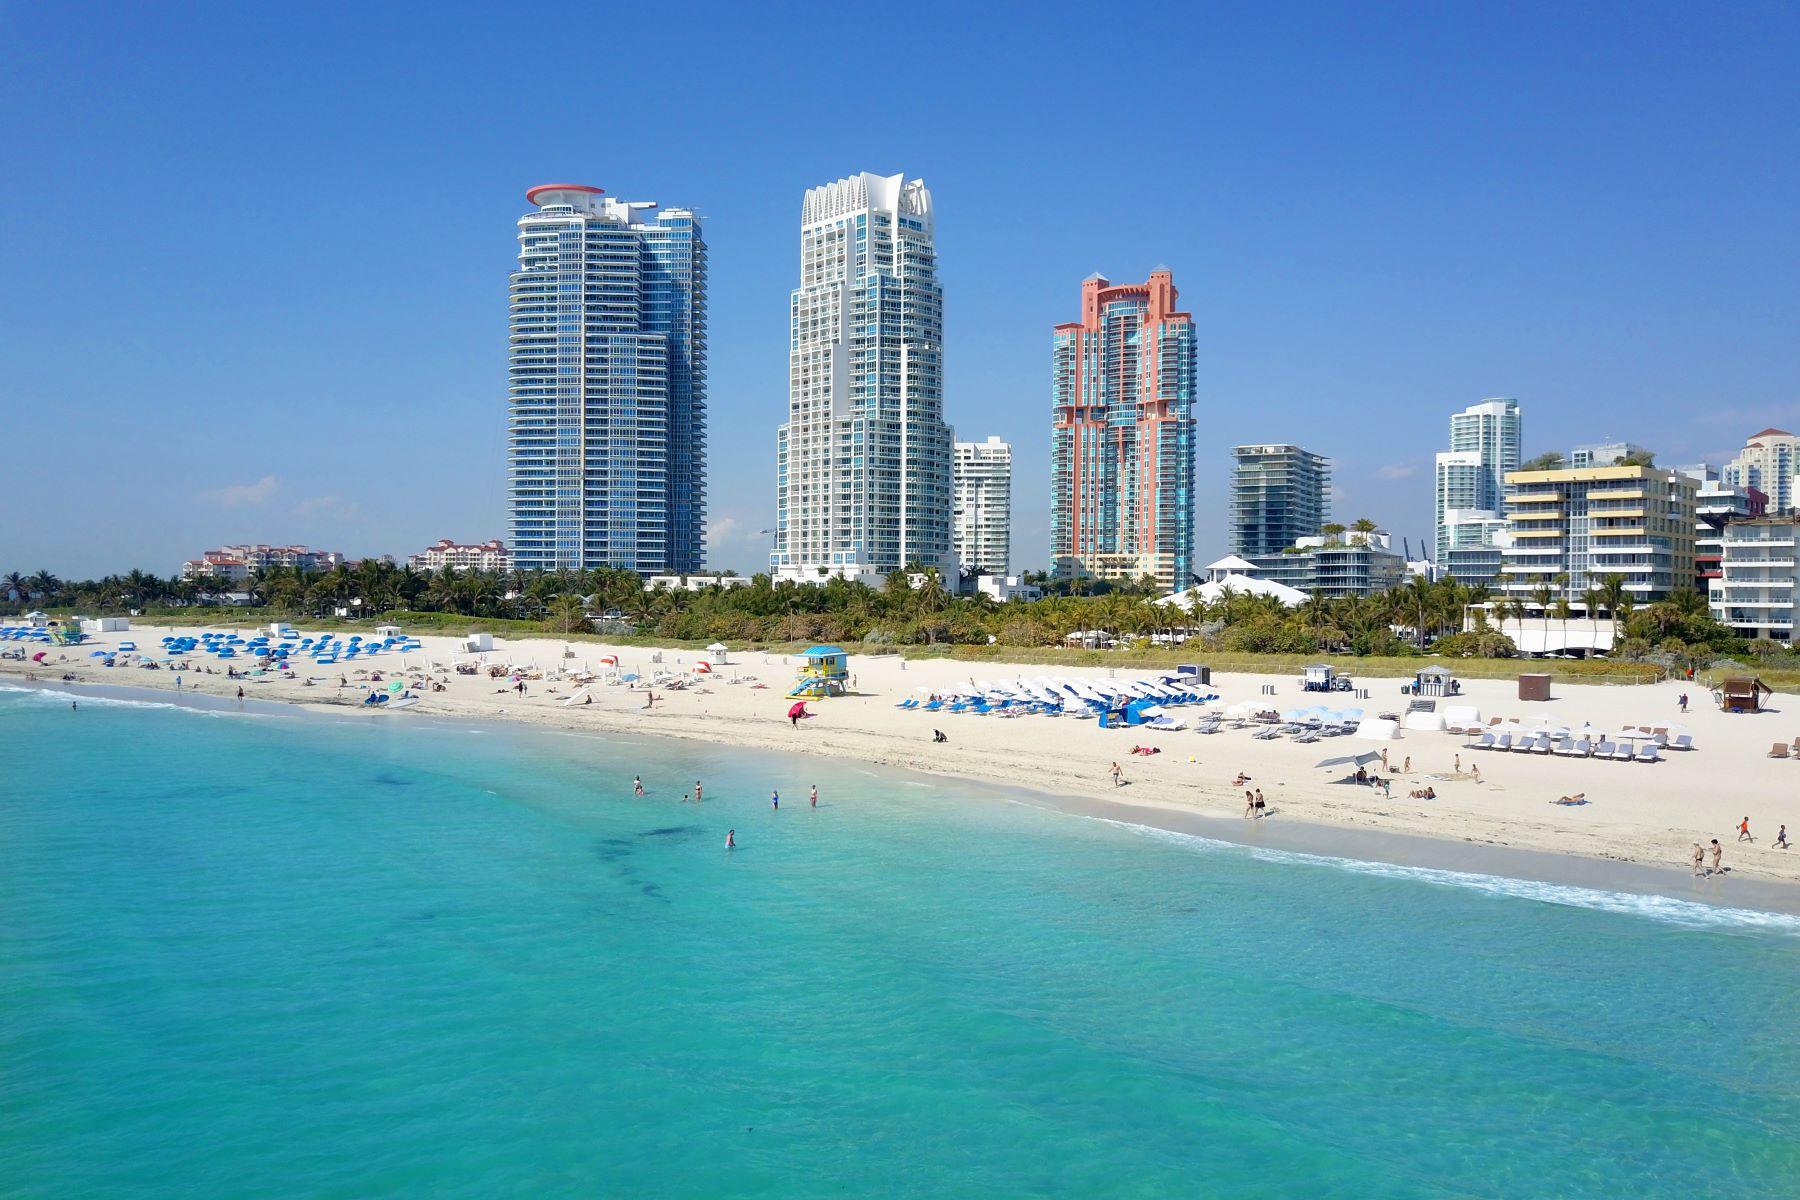 Condomínio para Venda às 100 S Pointe Dr #1404 100 SPointe Dr 1404 Miami Beach, Florida, 33139 Estados Unidos